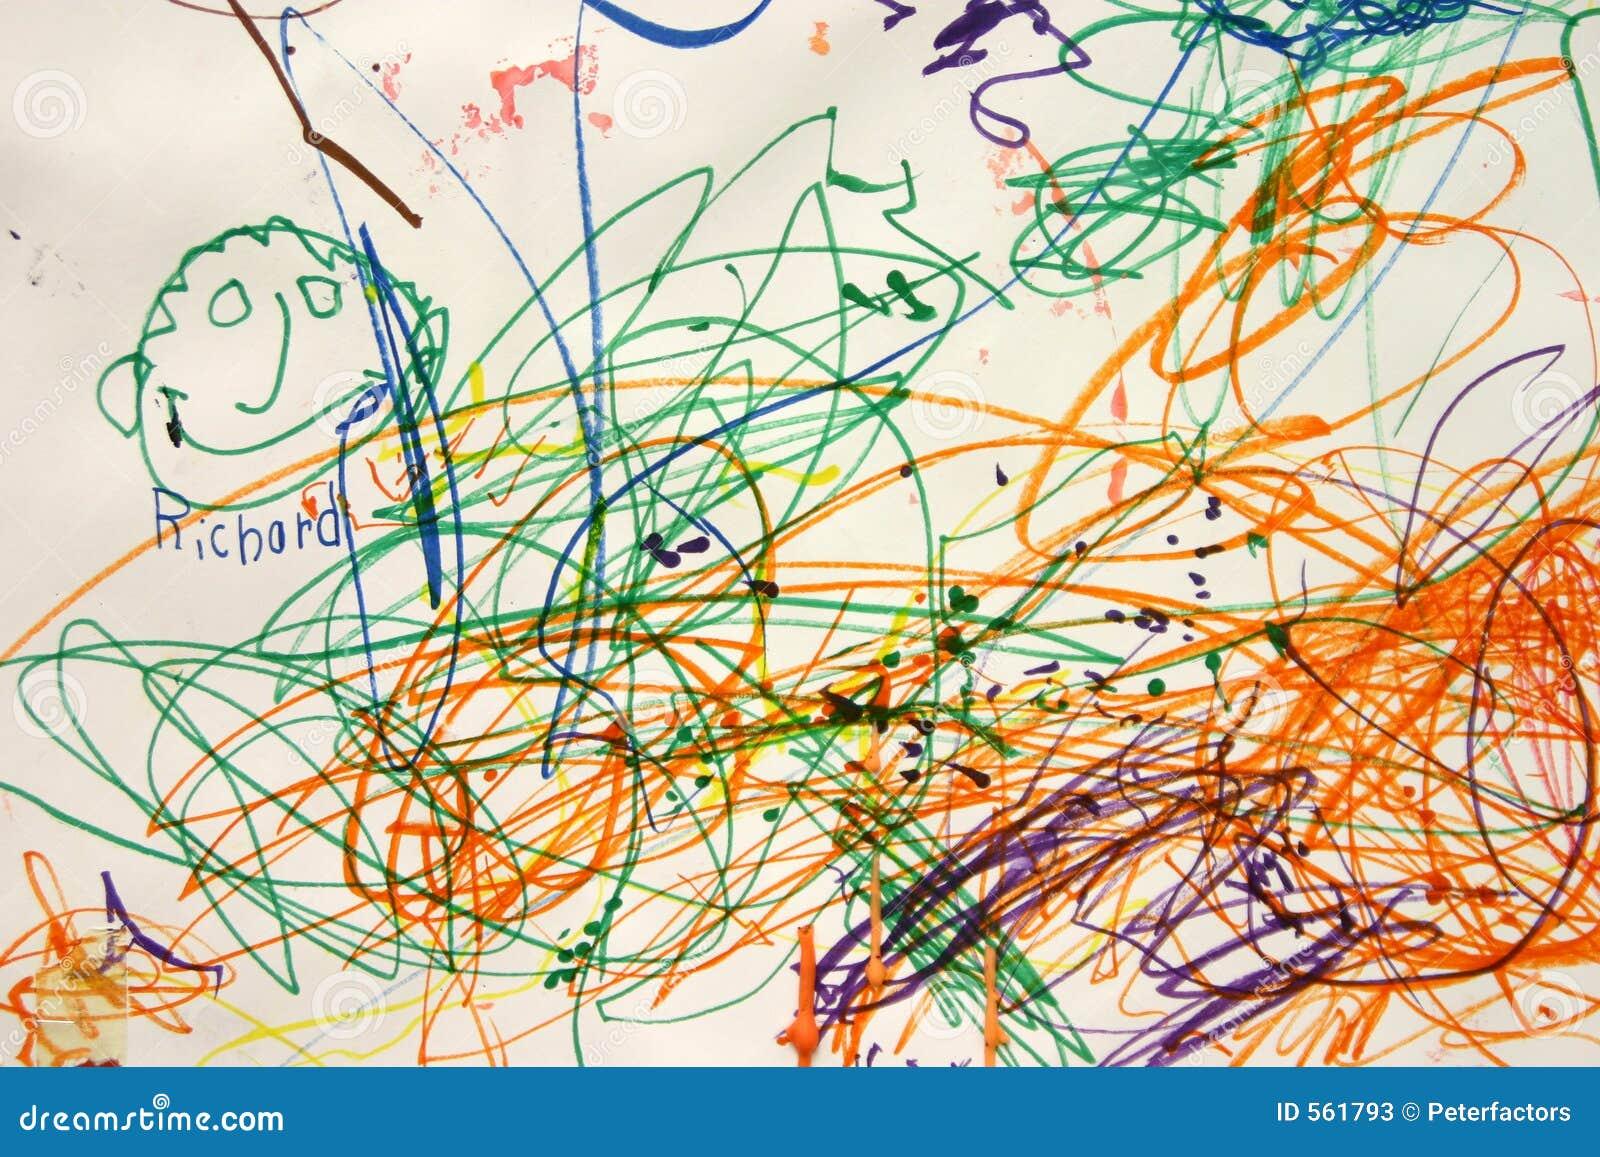 child art stock illustration illustration of burden creation 561793